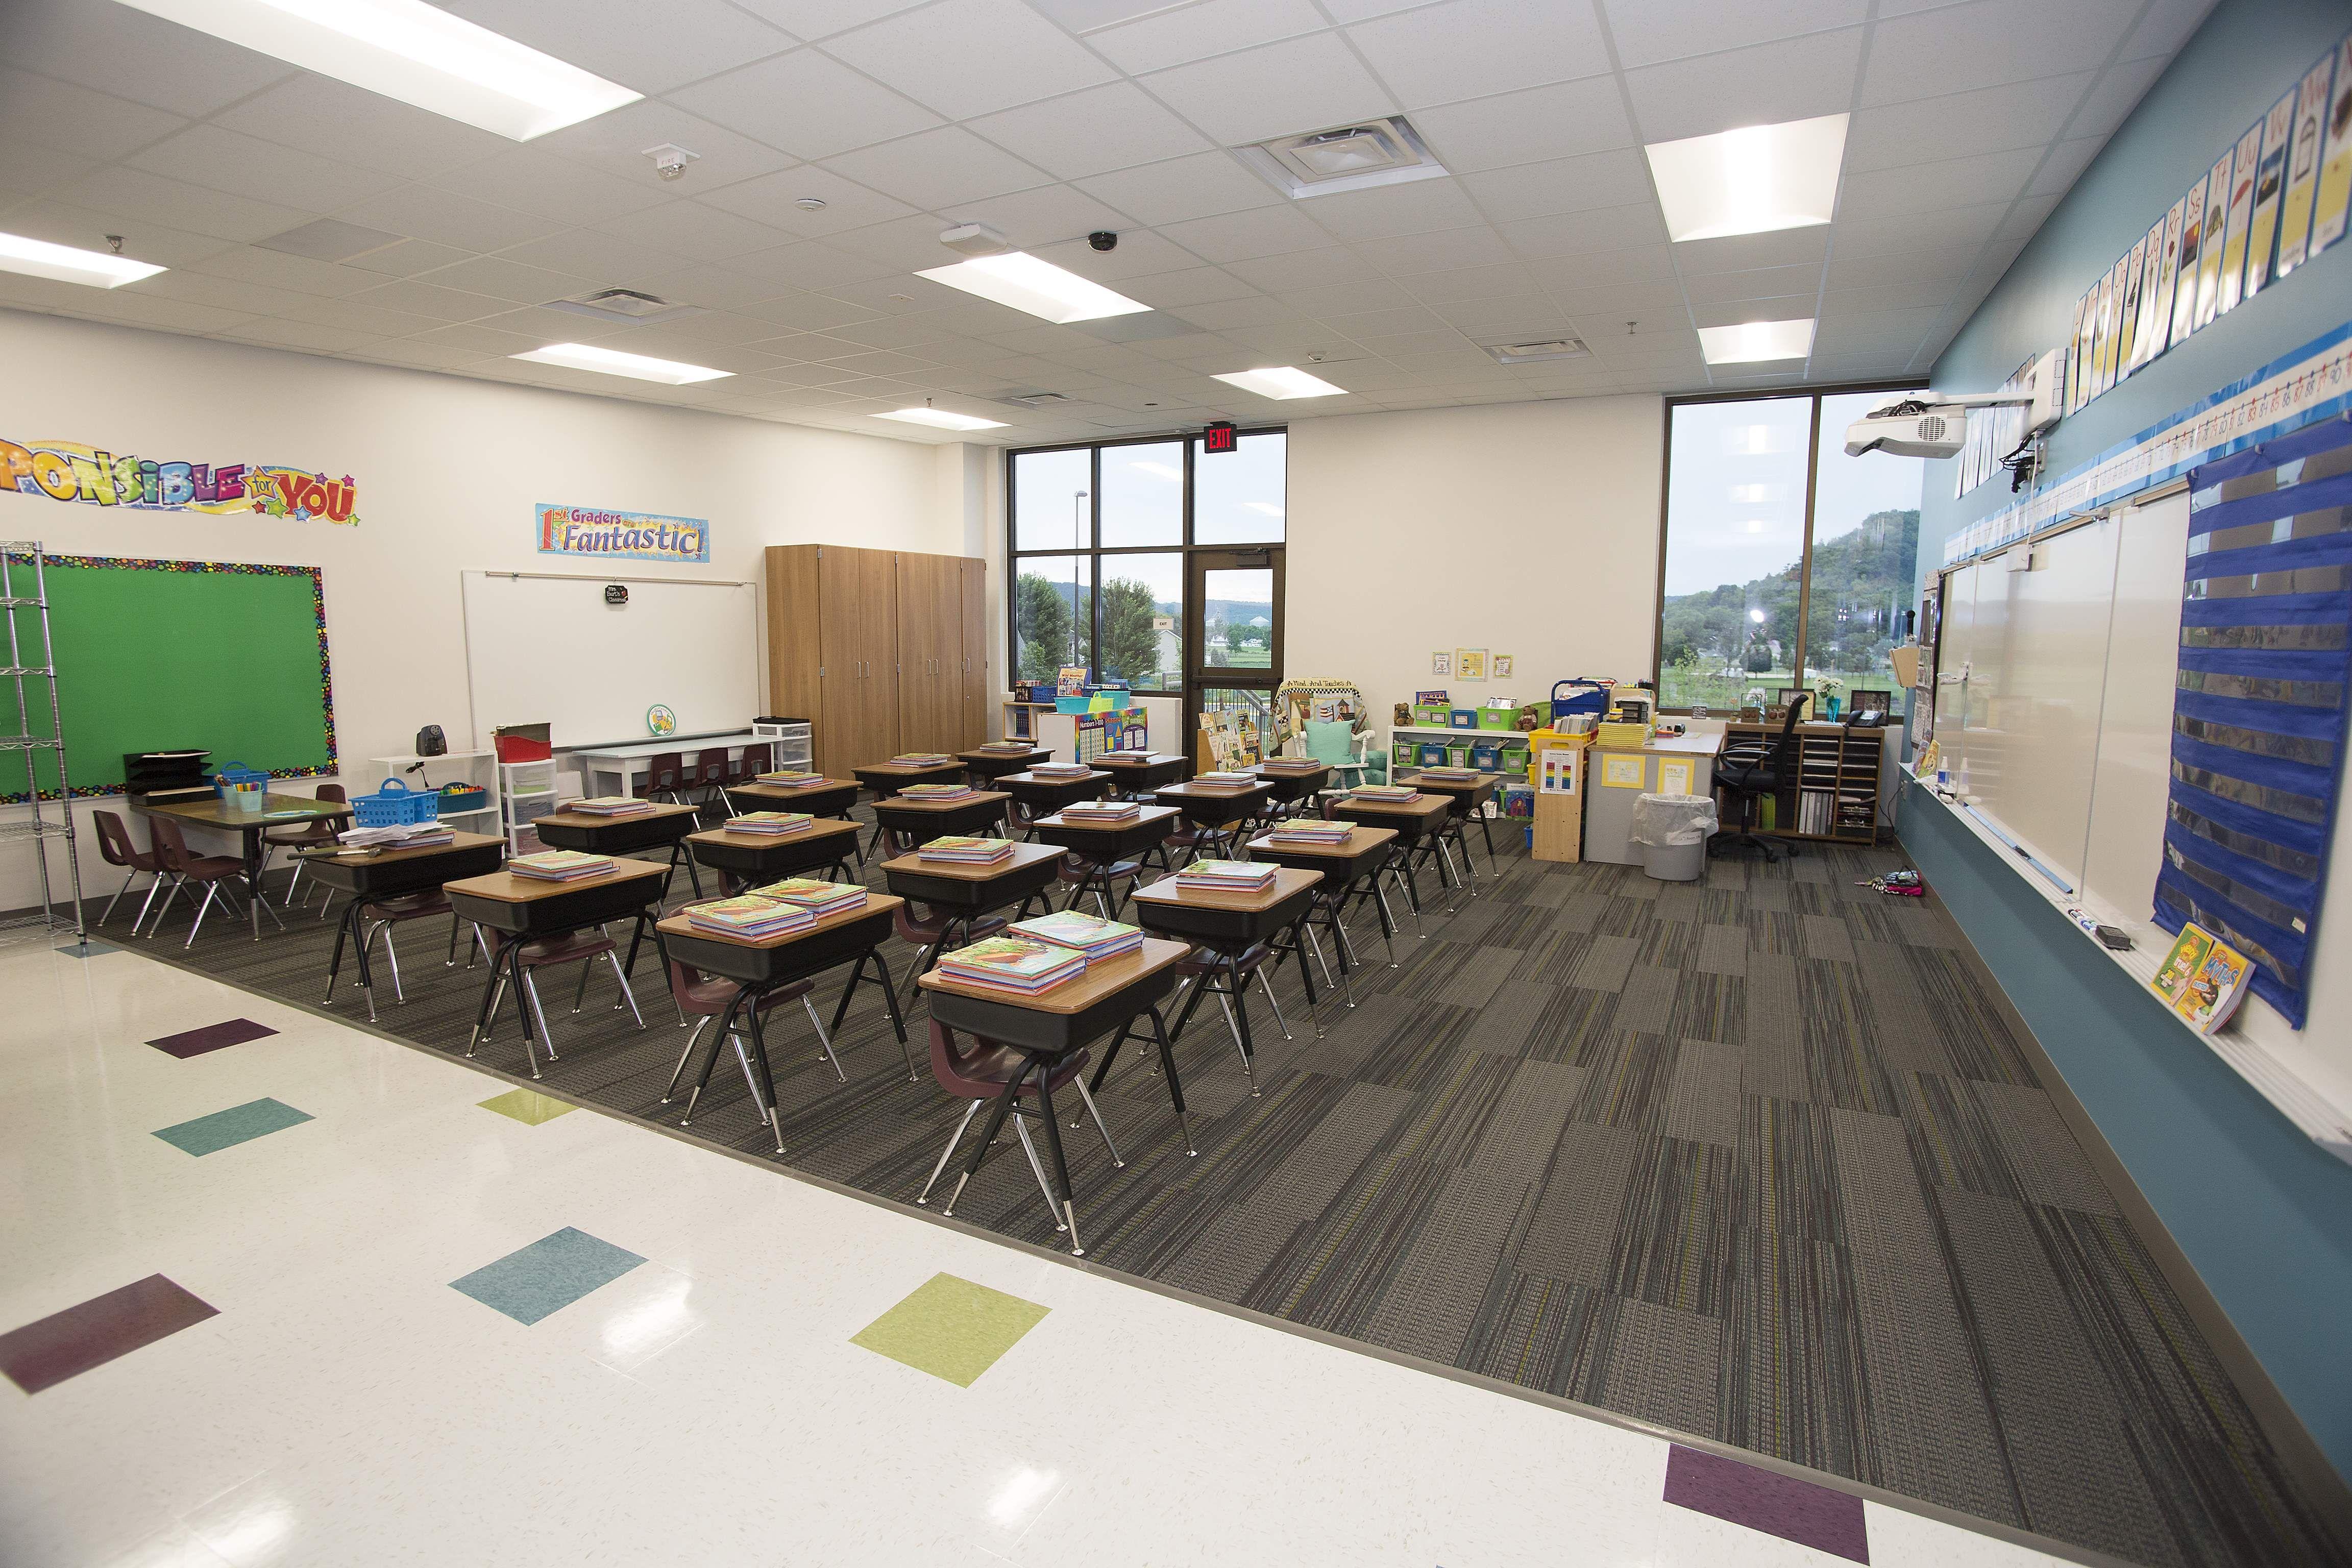 Elementary School Classroom...organized, education, learning ...